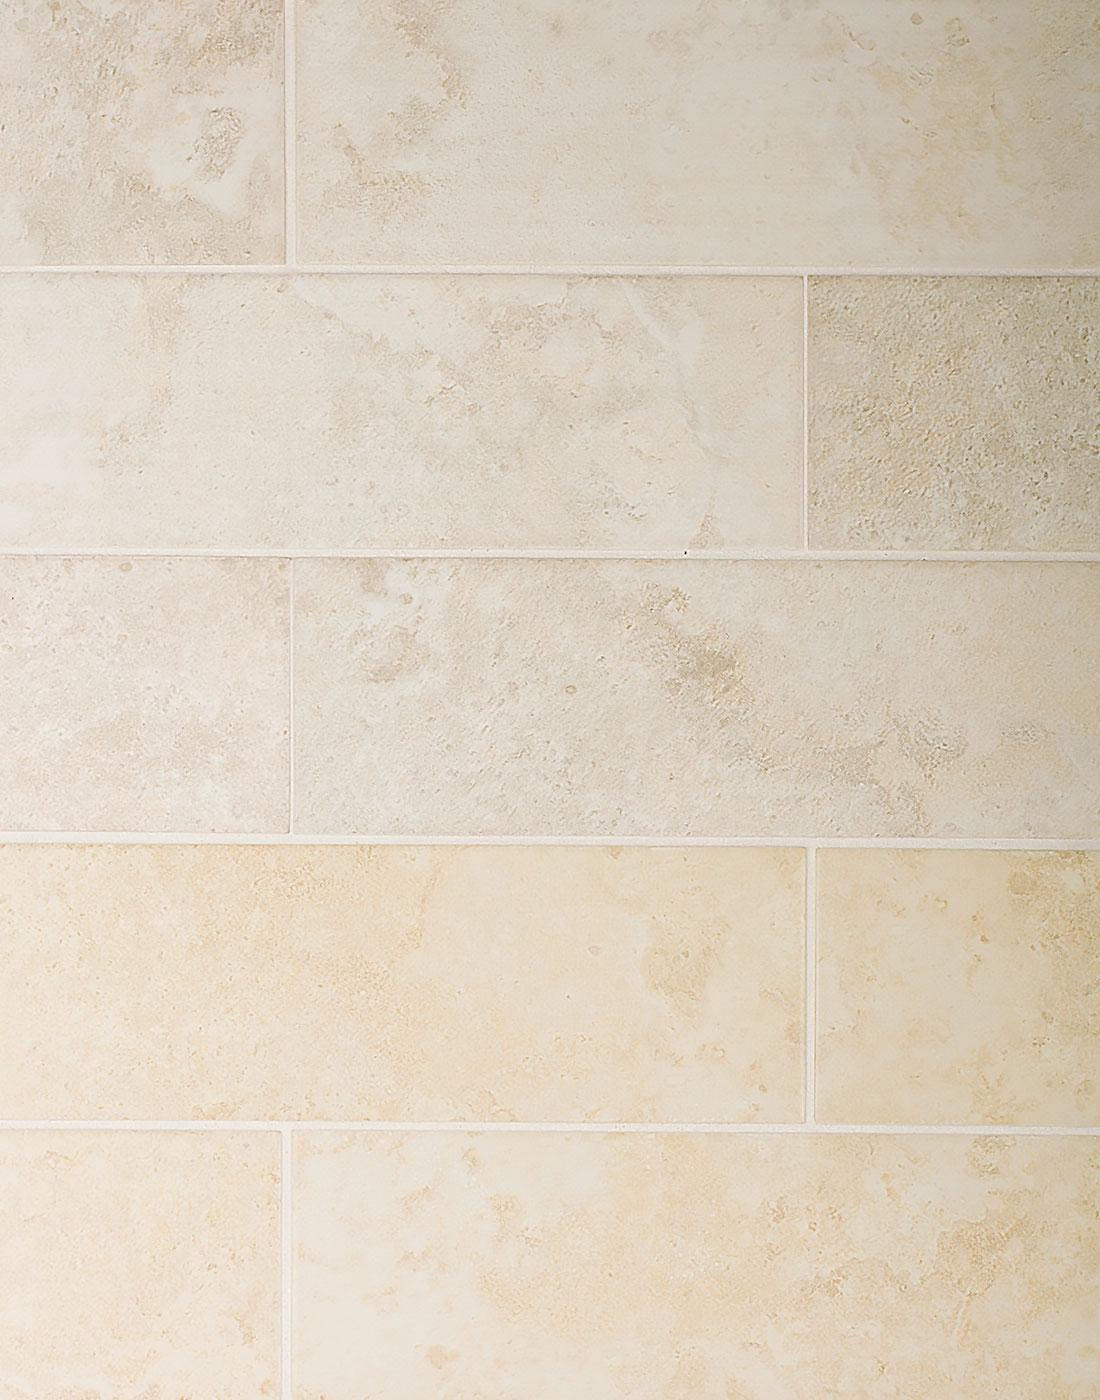 Mediterraneo Ocre Verdi Kitchen Wall Tiles 24 75m2